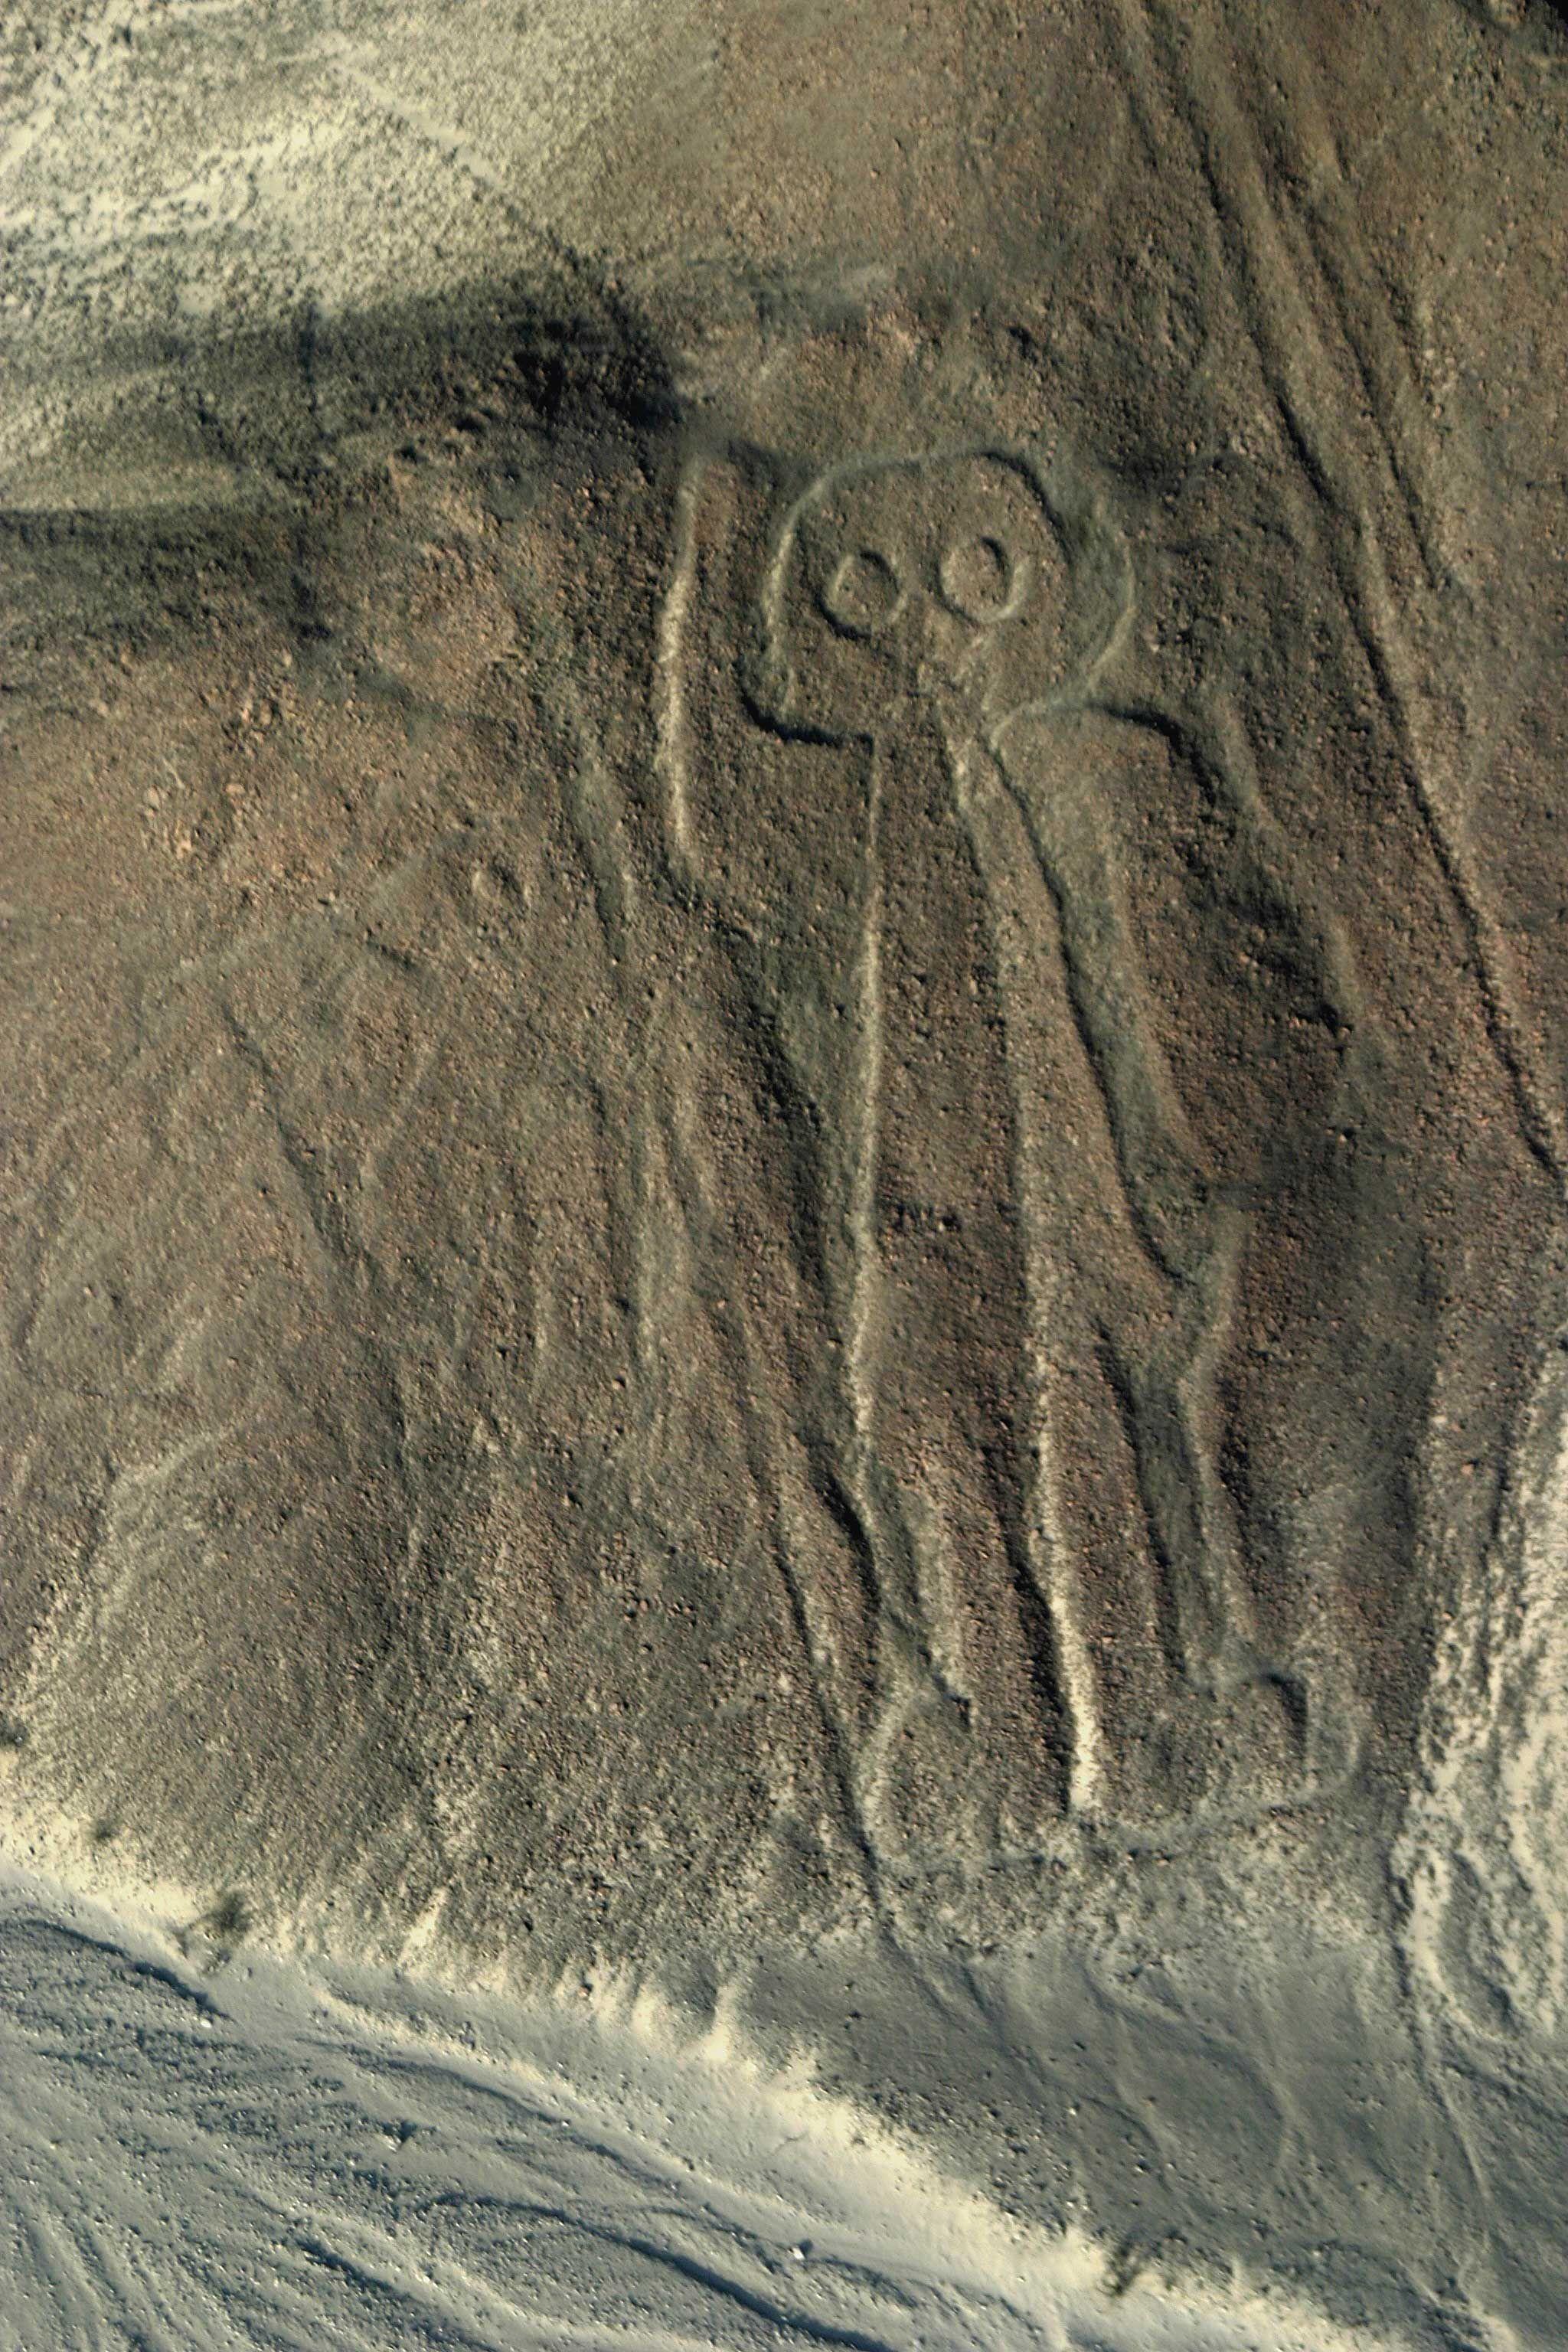 Secrets of drawings on the Nazca plateau 48